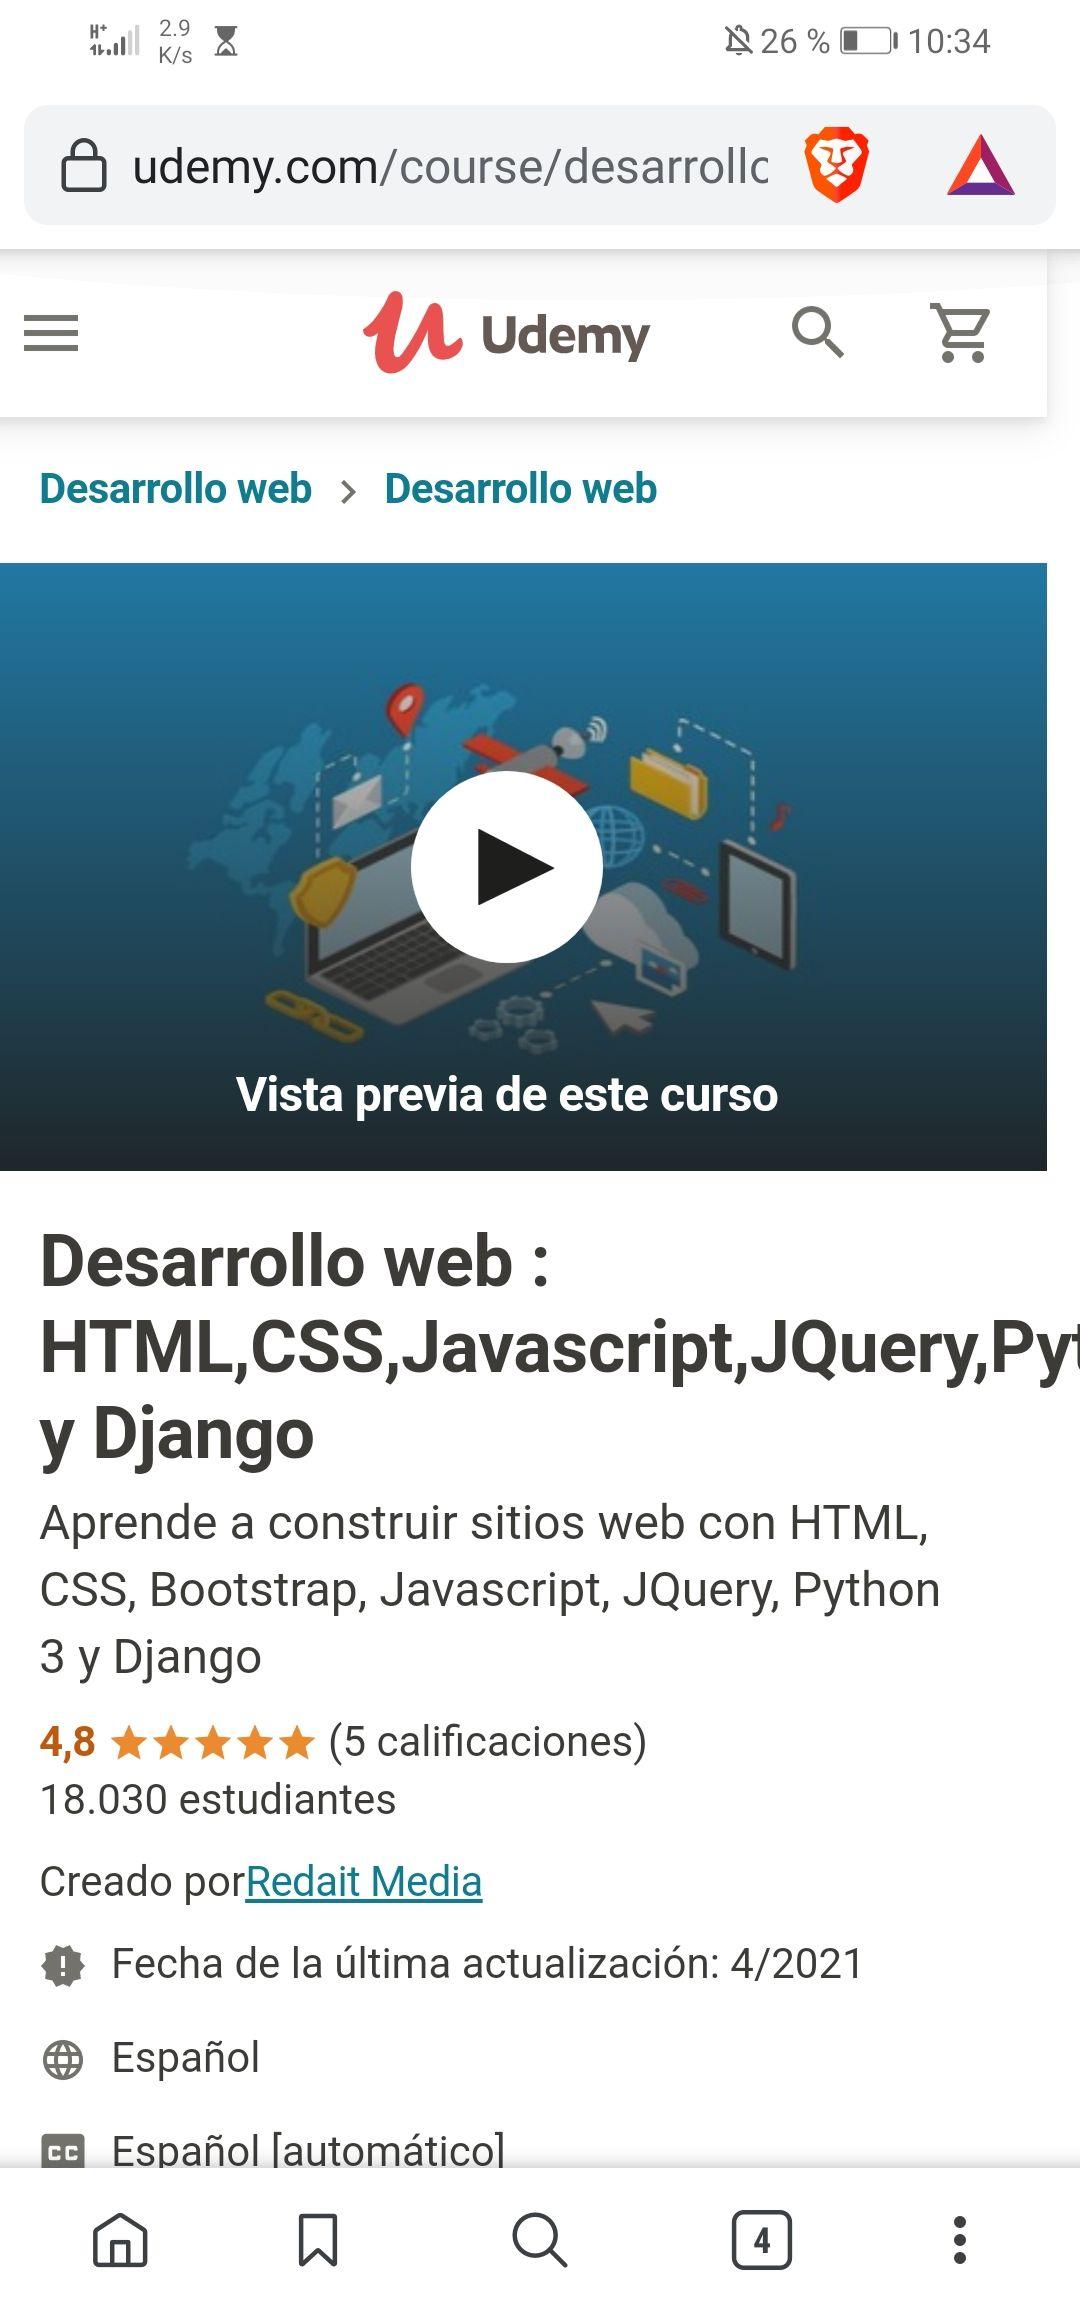 Udemy: Desarrollo web HTML, CSS, JAVASCRIPT, python y django